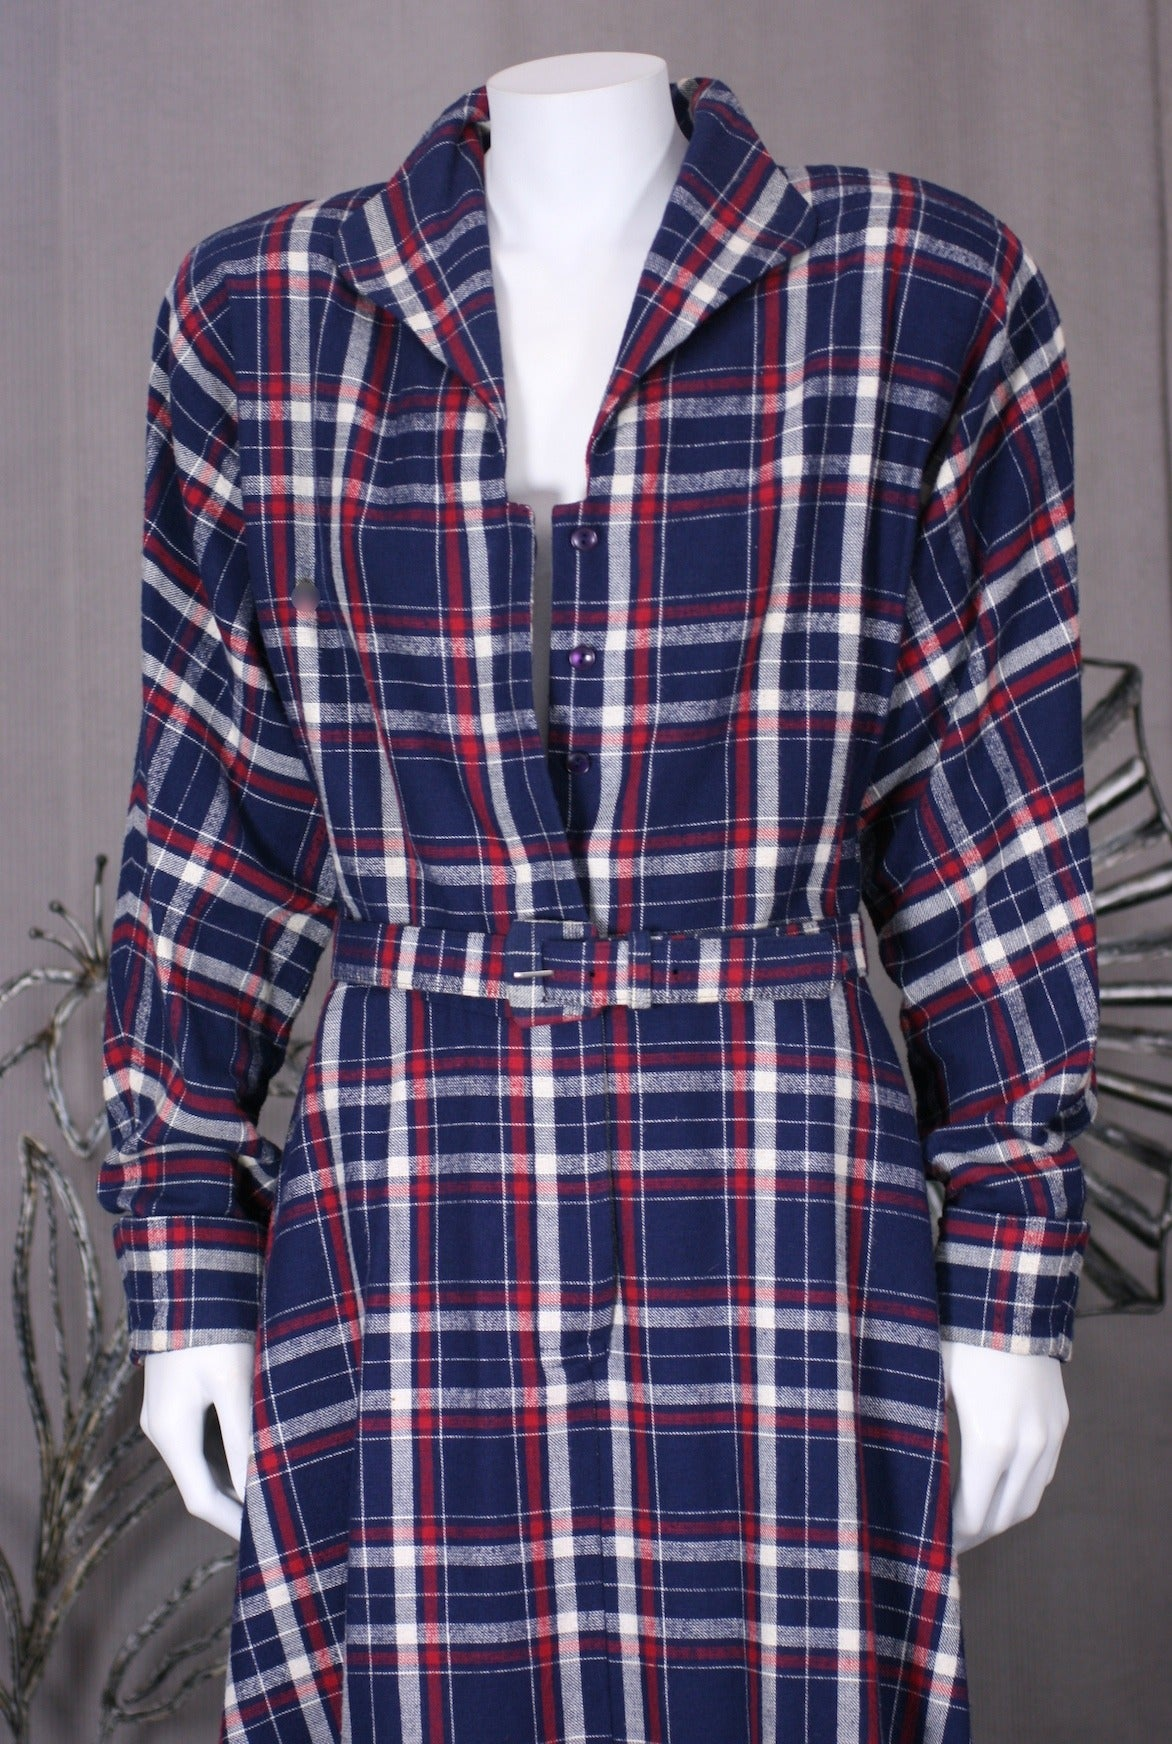 Norma Kamali's Patriotic Flannel Shirtwaist 1